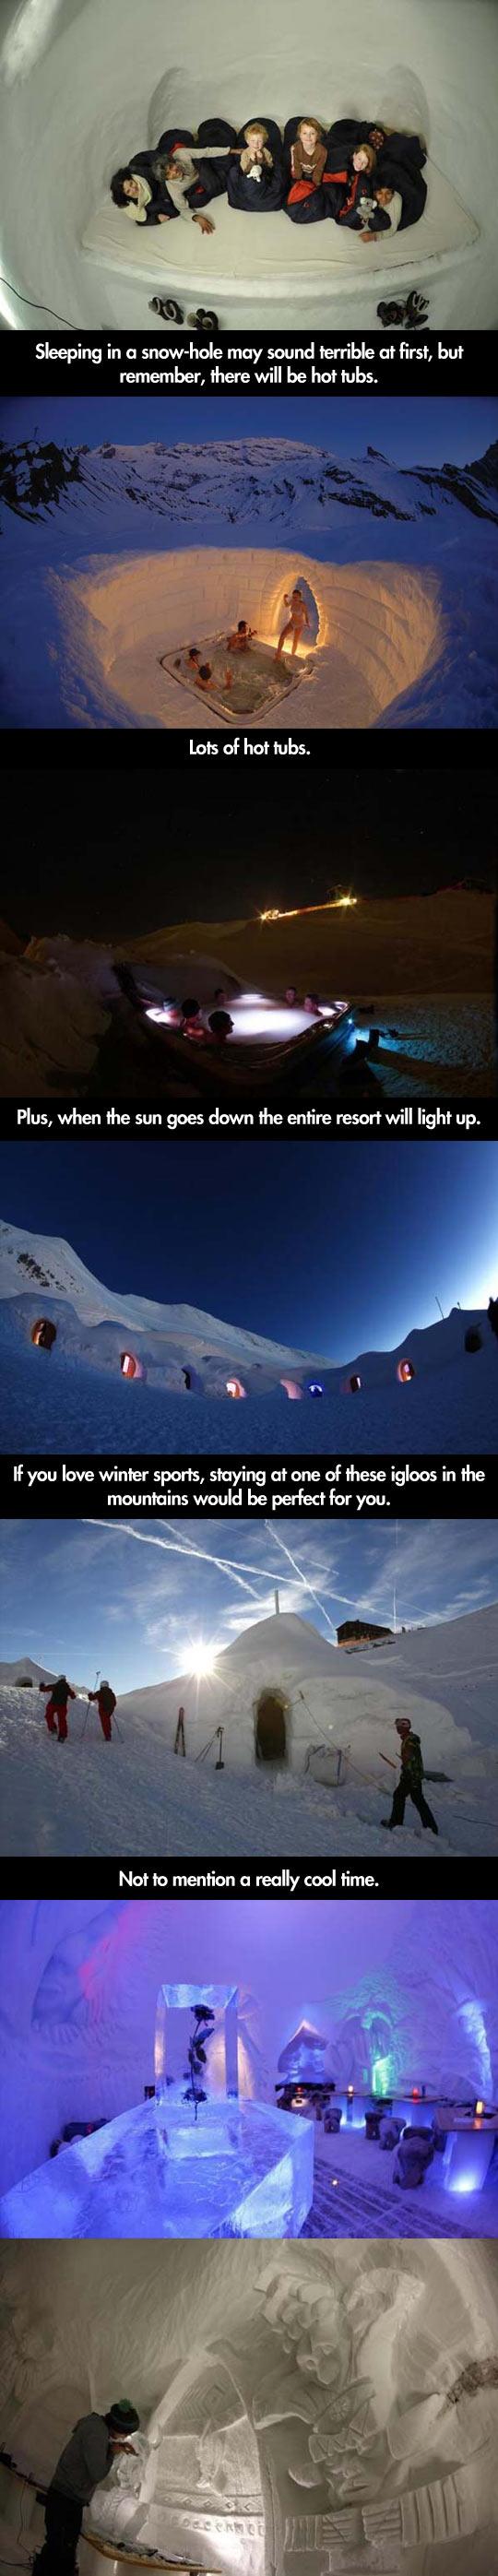 cool-igloo-village-mountains-Europe-sleeping